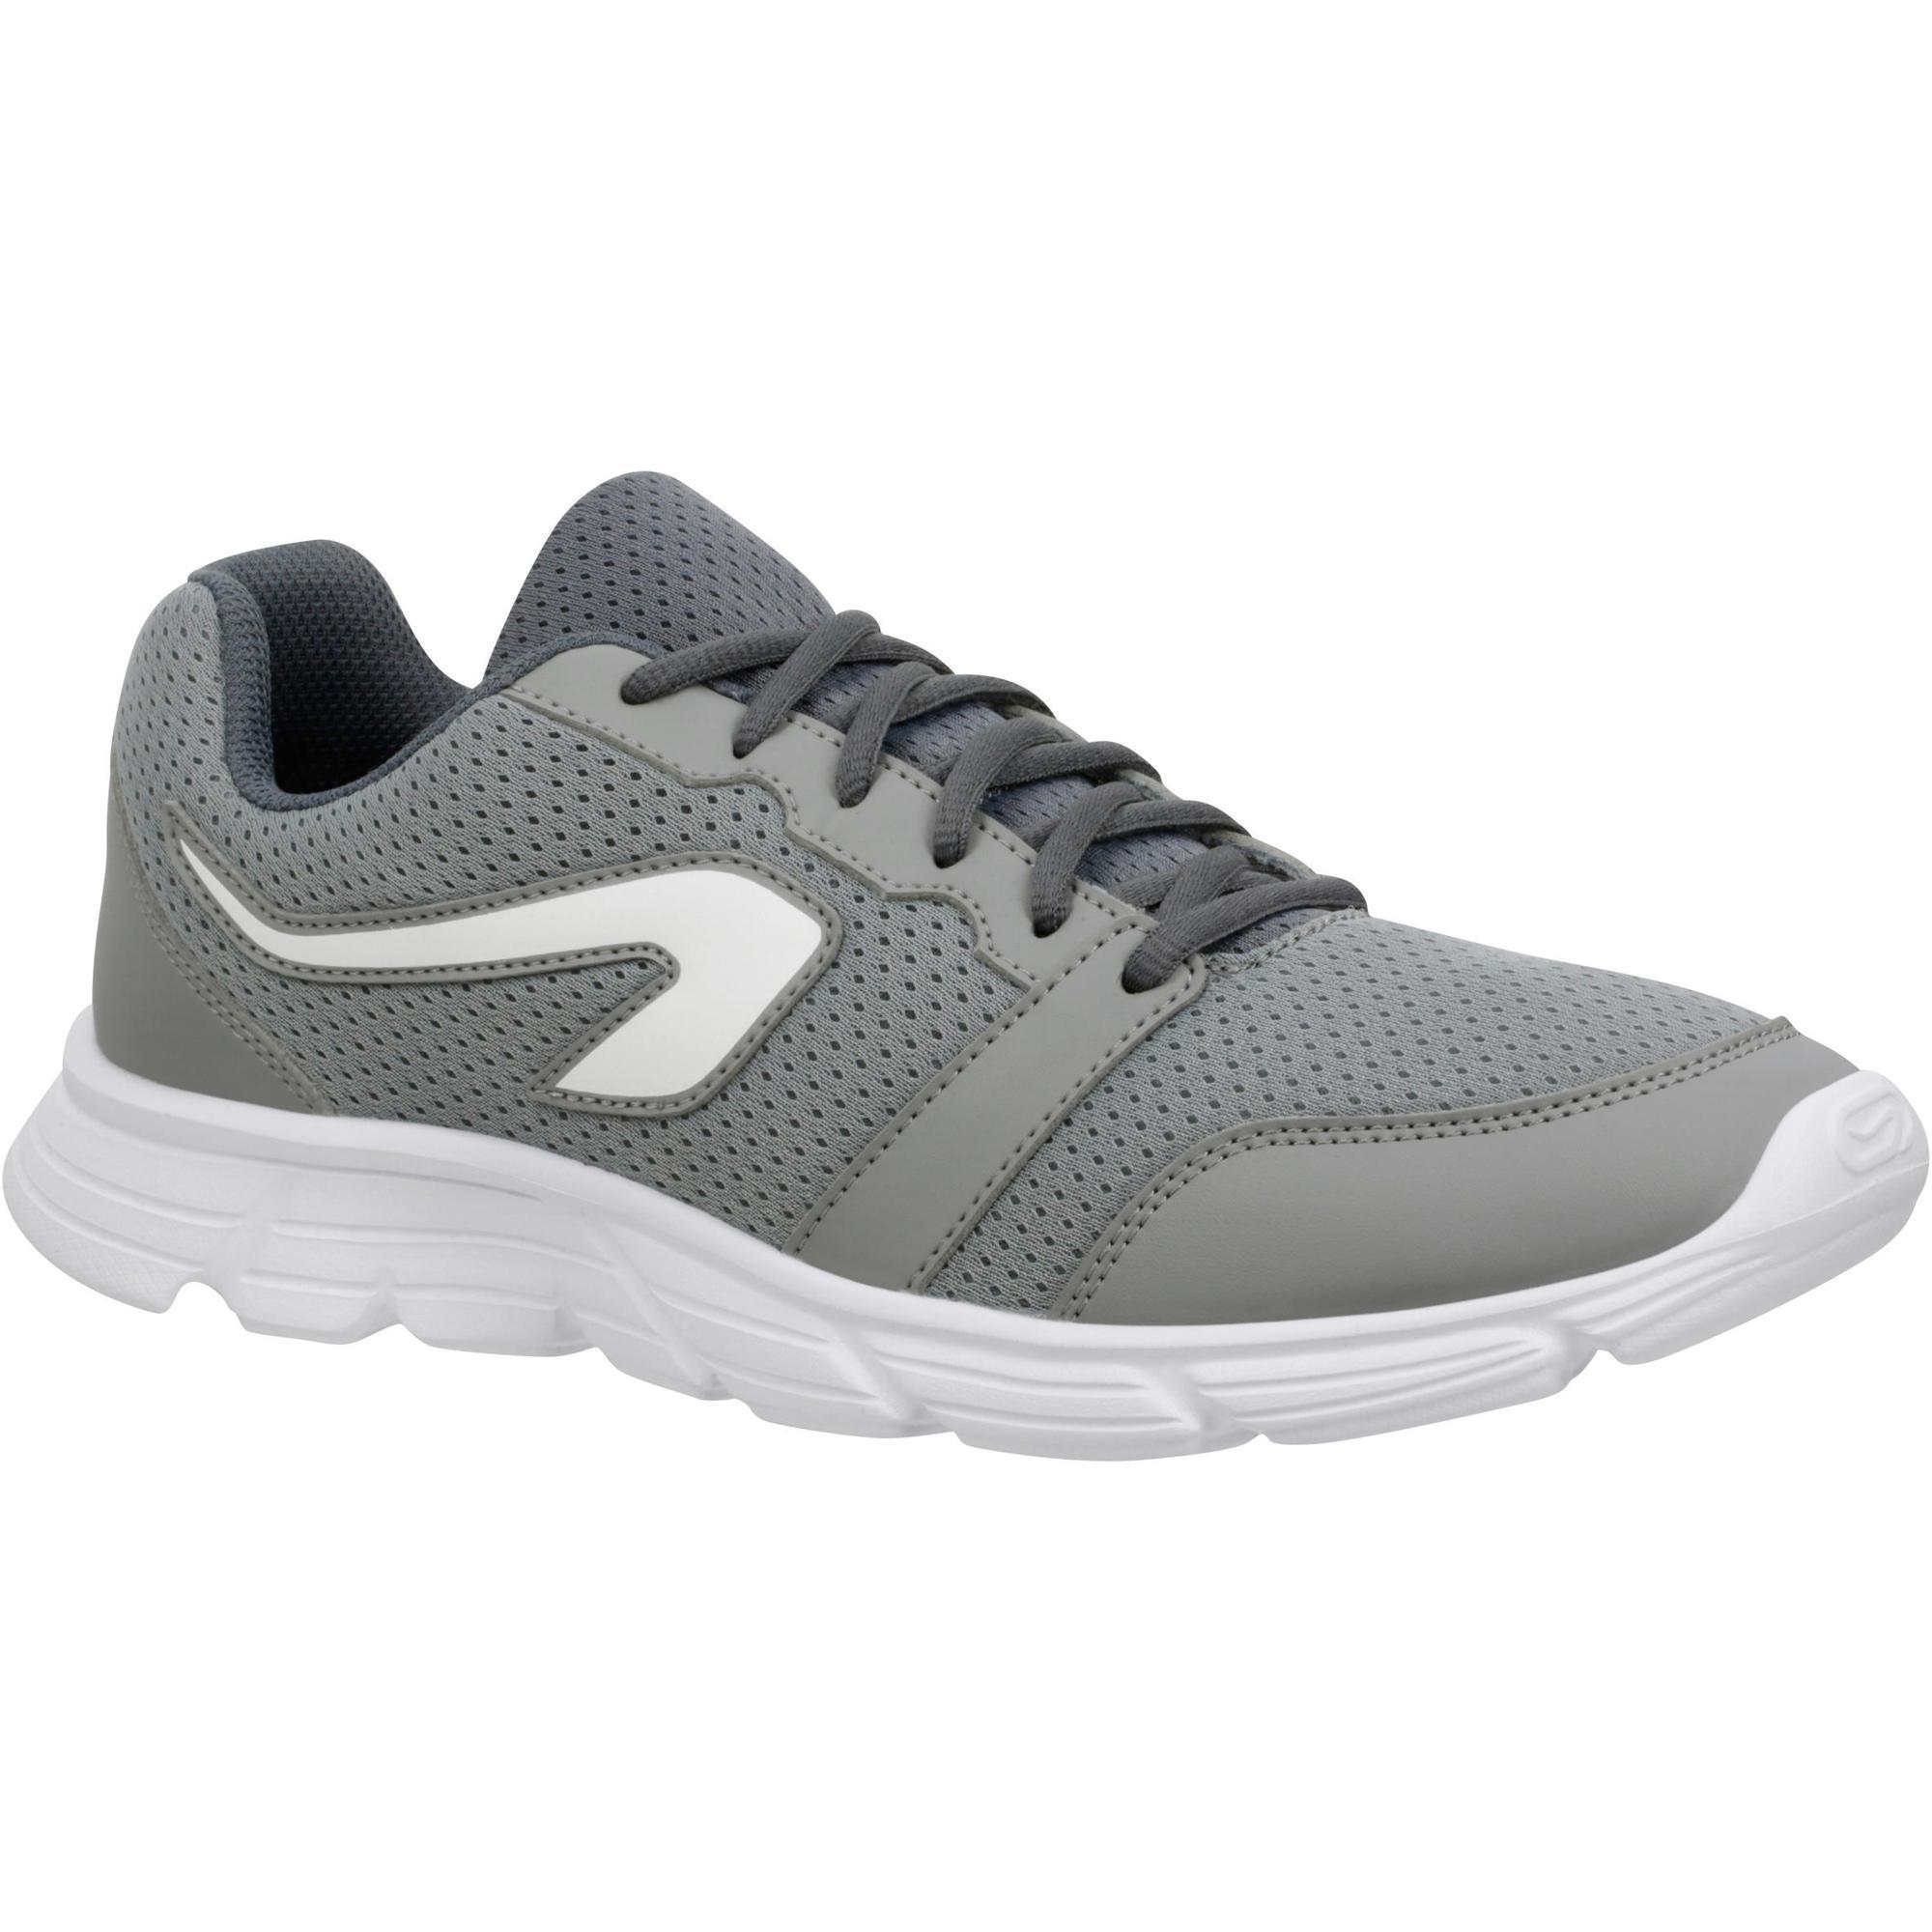 lluvia Rugido dígito  nike air zoom pegasus 35 decathlon Shop Clothing & Shoes Online